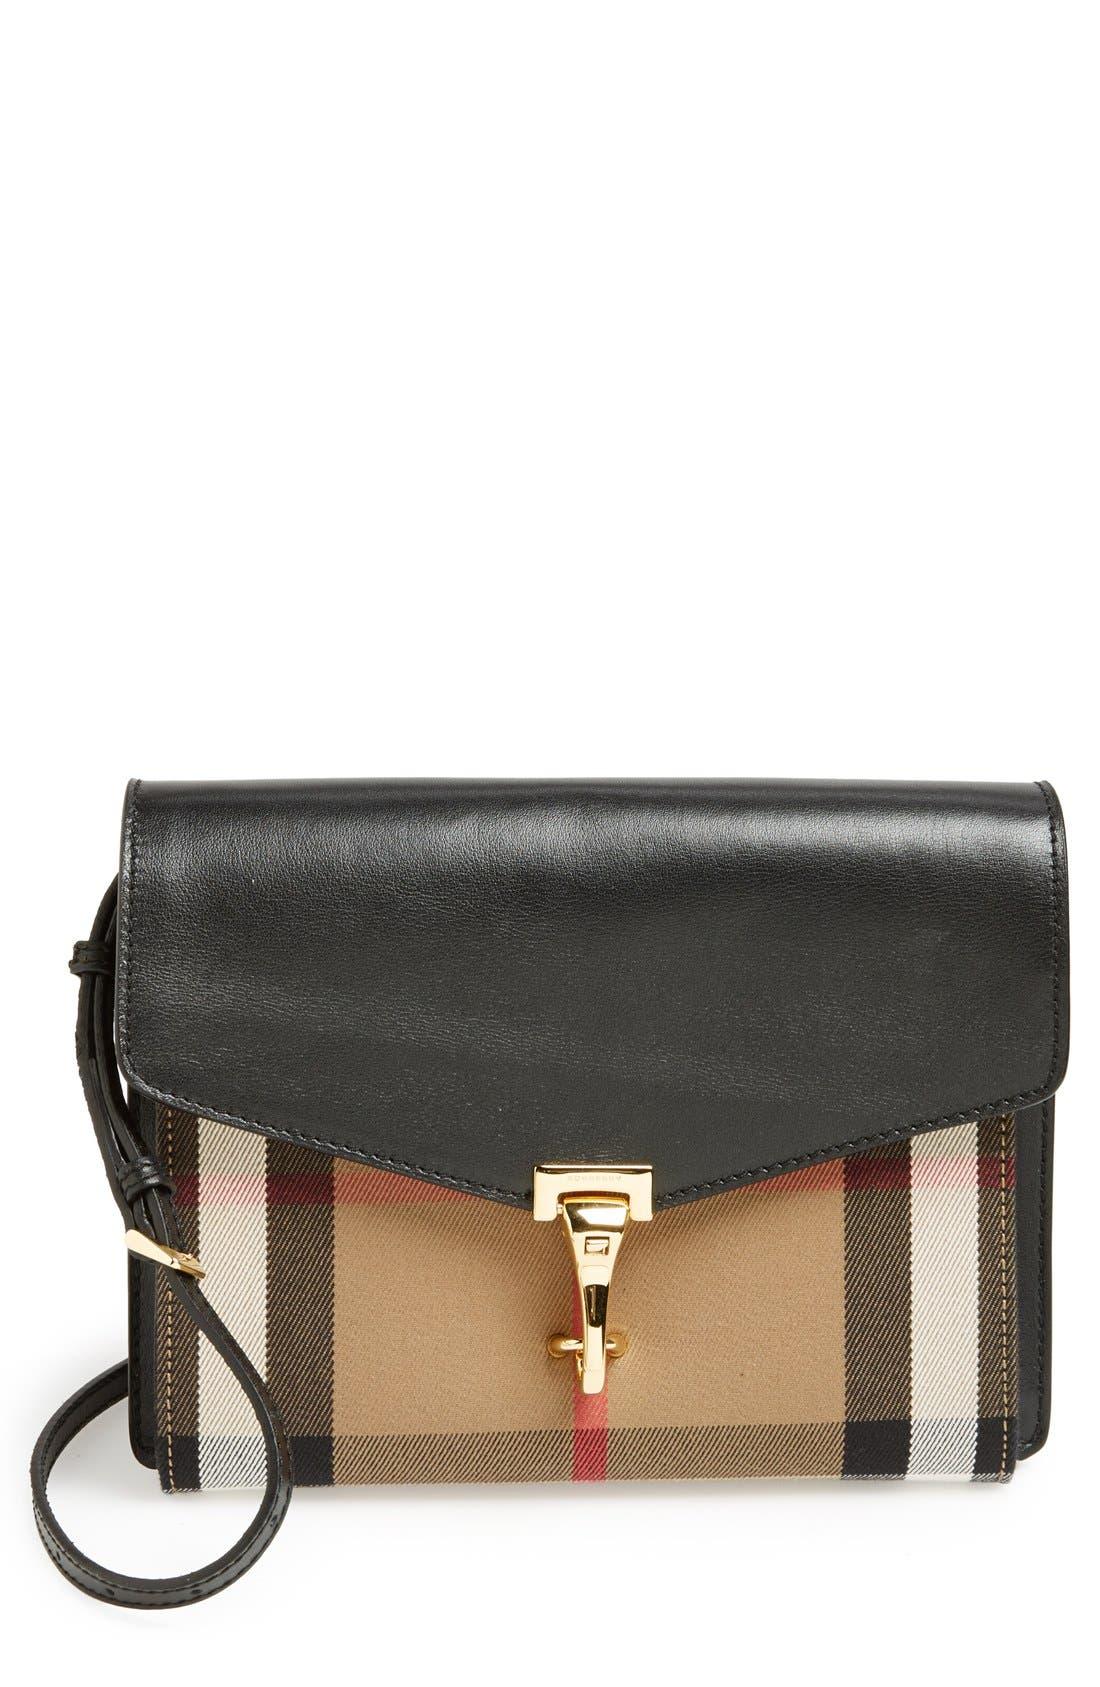 Alternate Image 1 Selected - Burberry 'Small Macken' Crossbody Bag